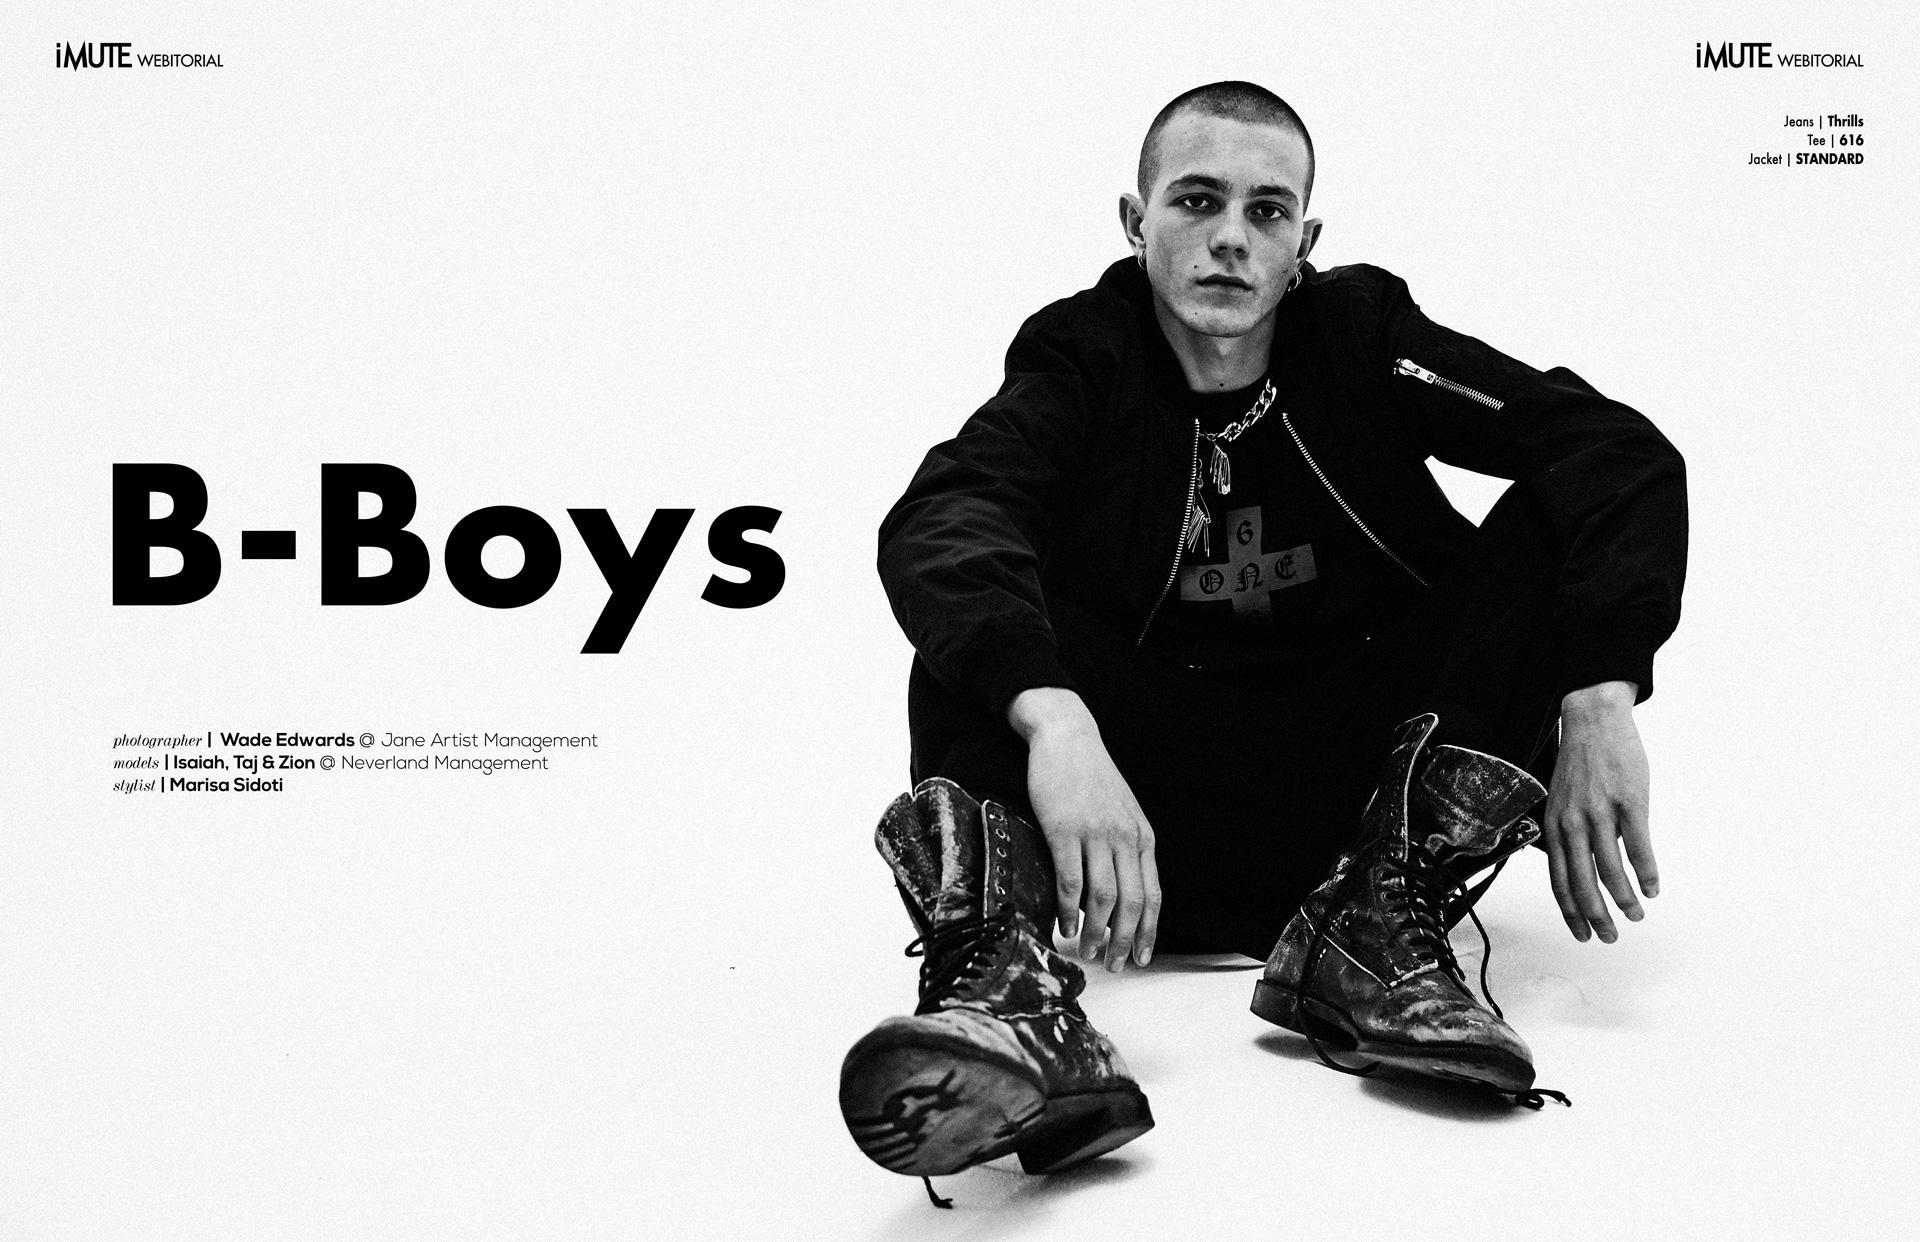 B-Boys-webitorial-for-iMute-Magazine.jpg